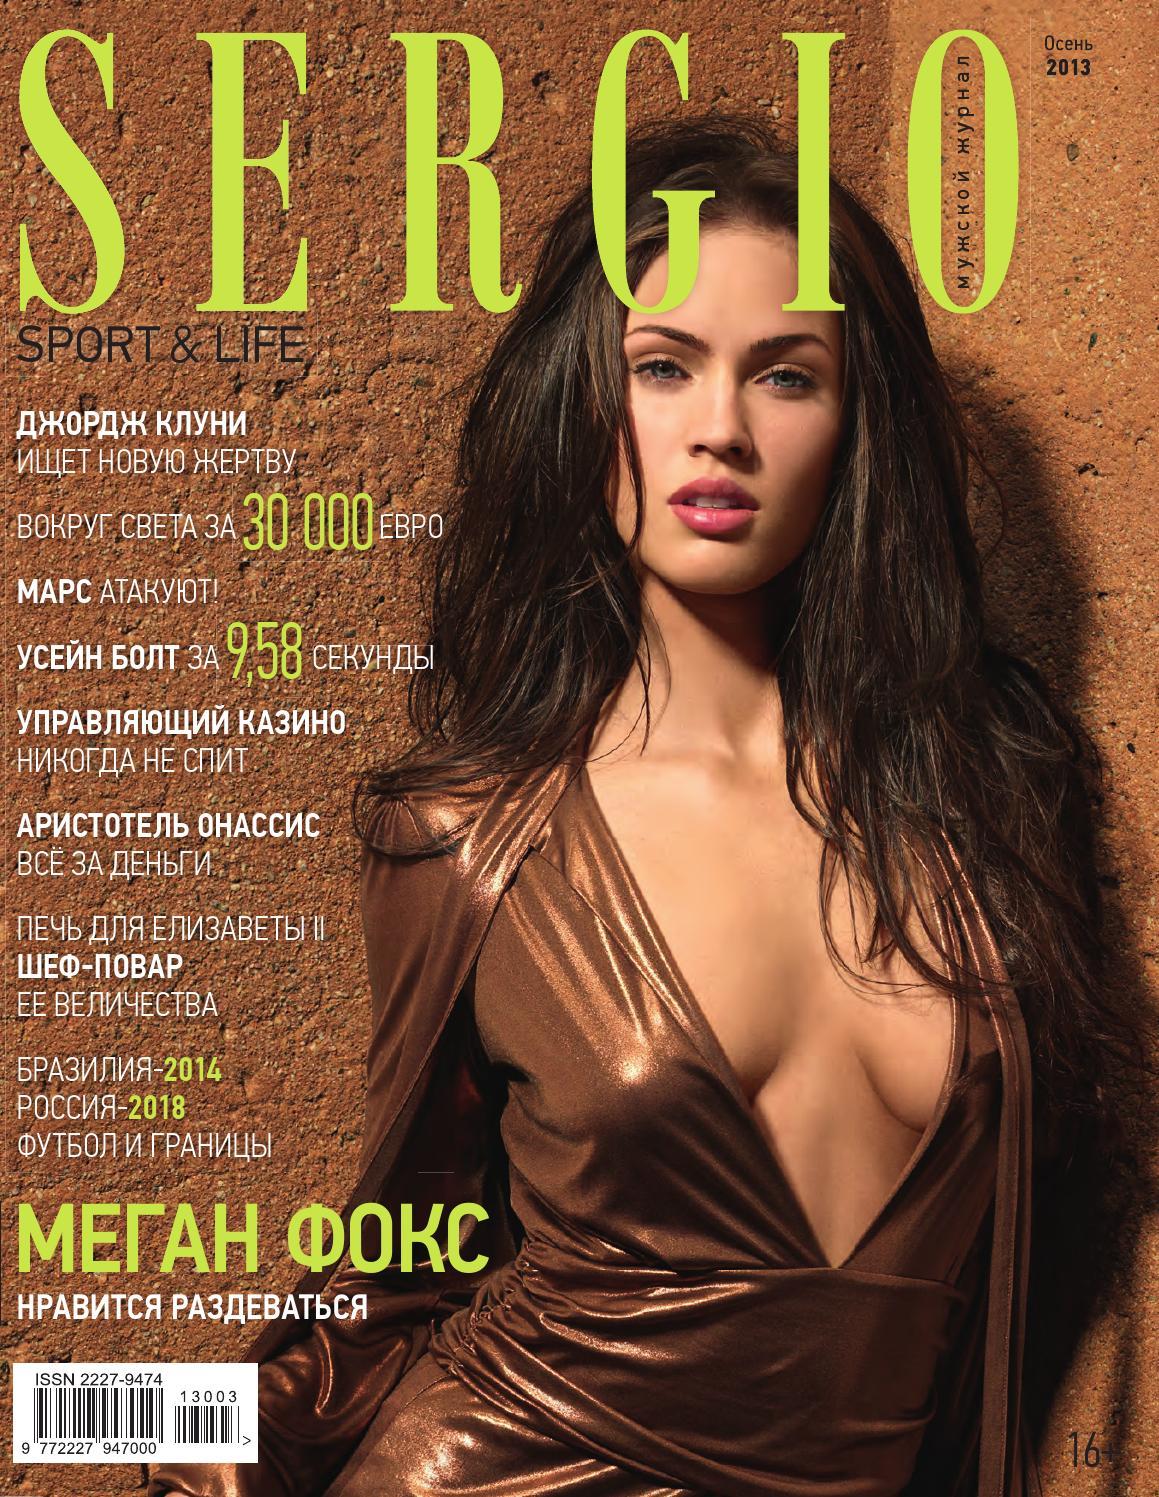 татьяна бондаренко инфинити журнал максим